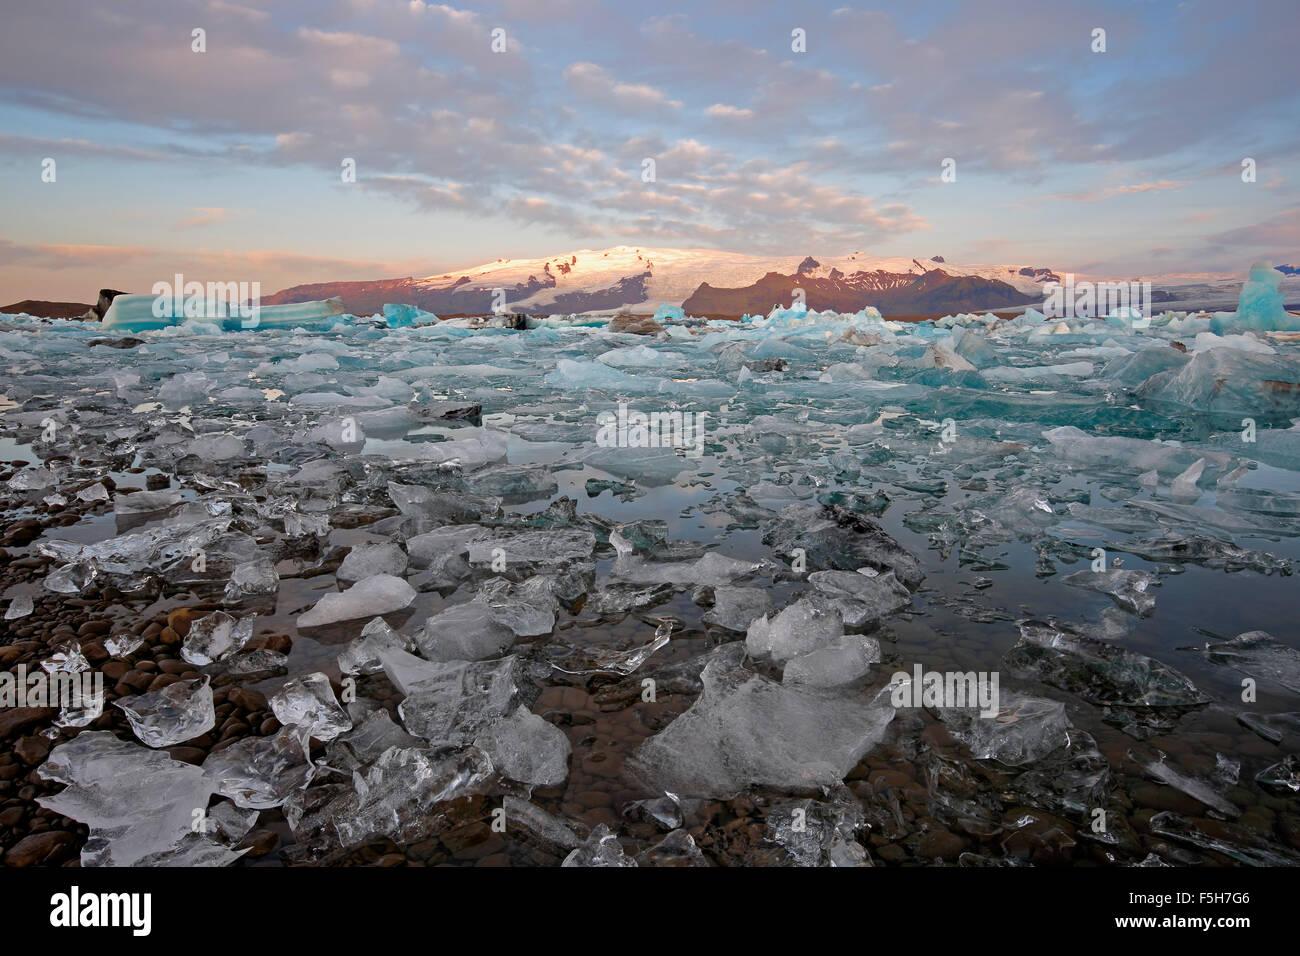 Ice, icebergs and snow-covered mountains, Jokulsarlon Glacier Lagoon, Vatnajokull Glacier, Vatnajokull National - Stock Image